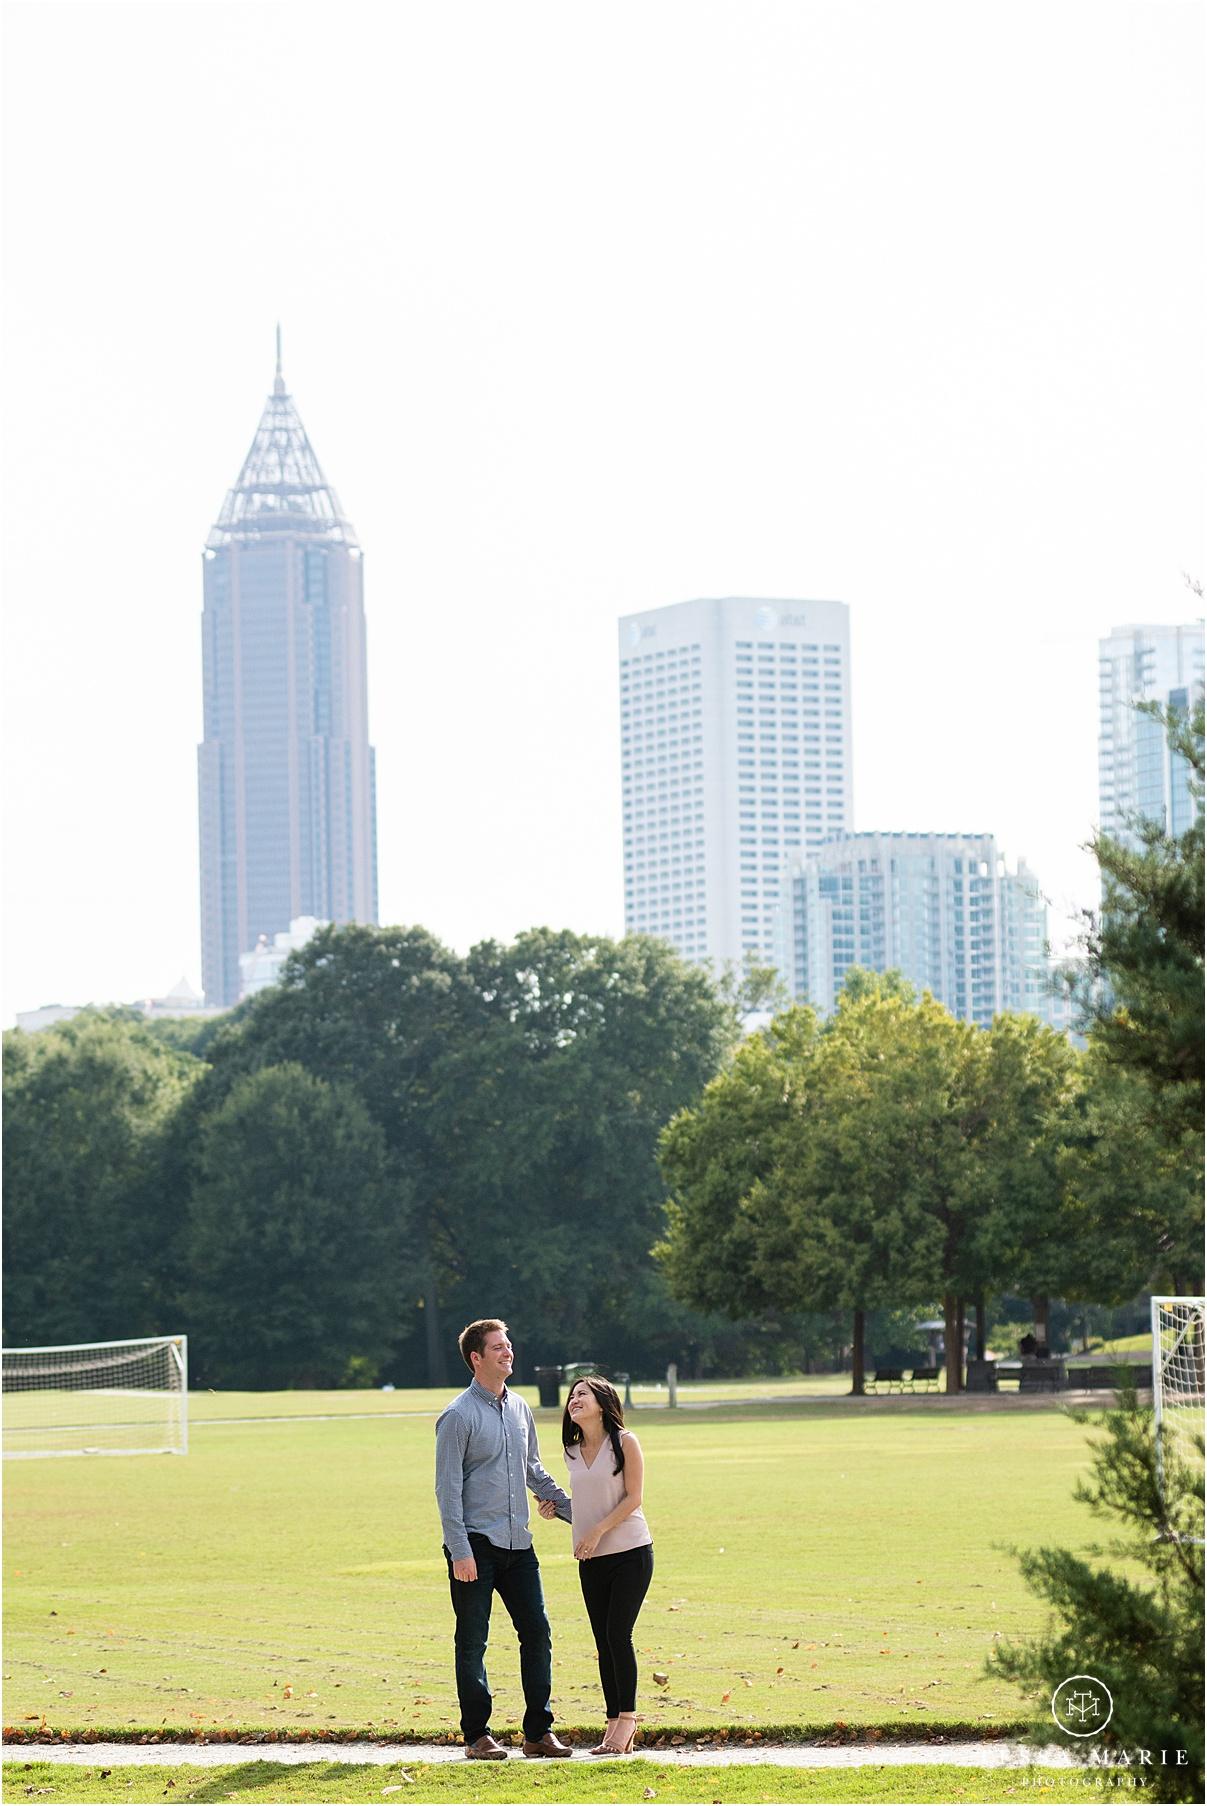 Tessa_marie_photography_wedding_photographer_engagement_pictures_piedmont_park_0011.jpg